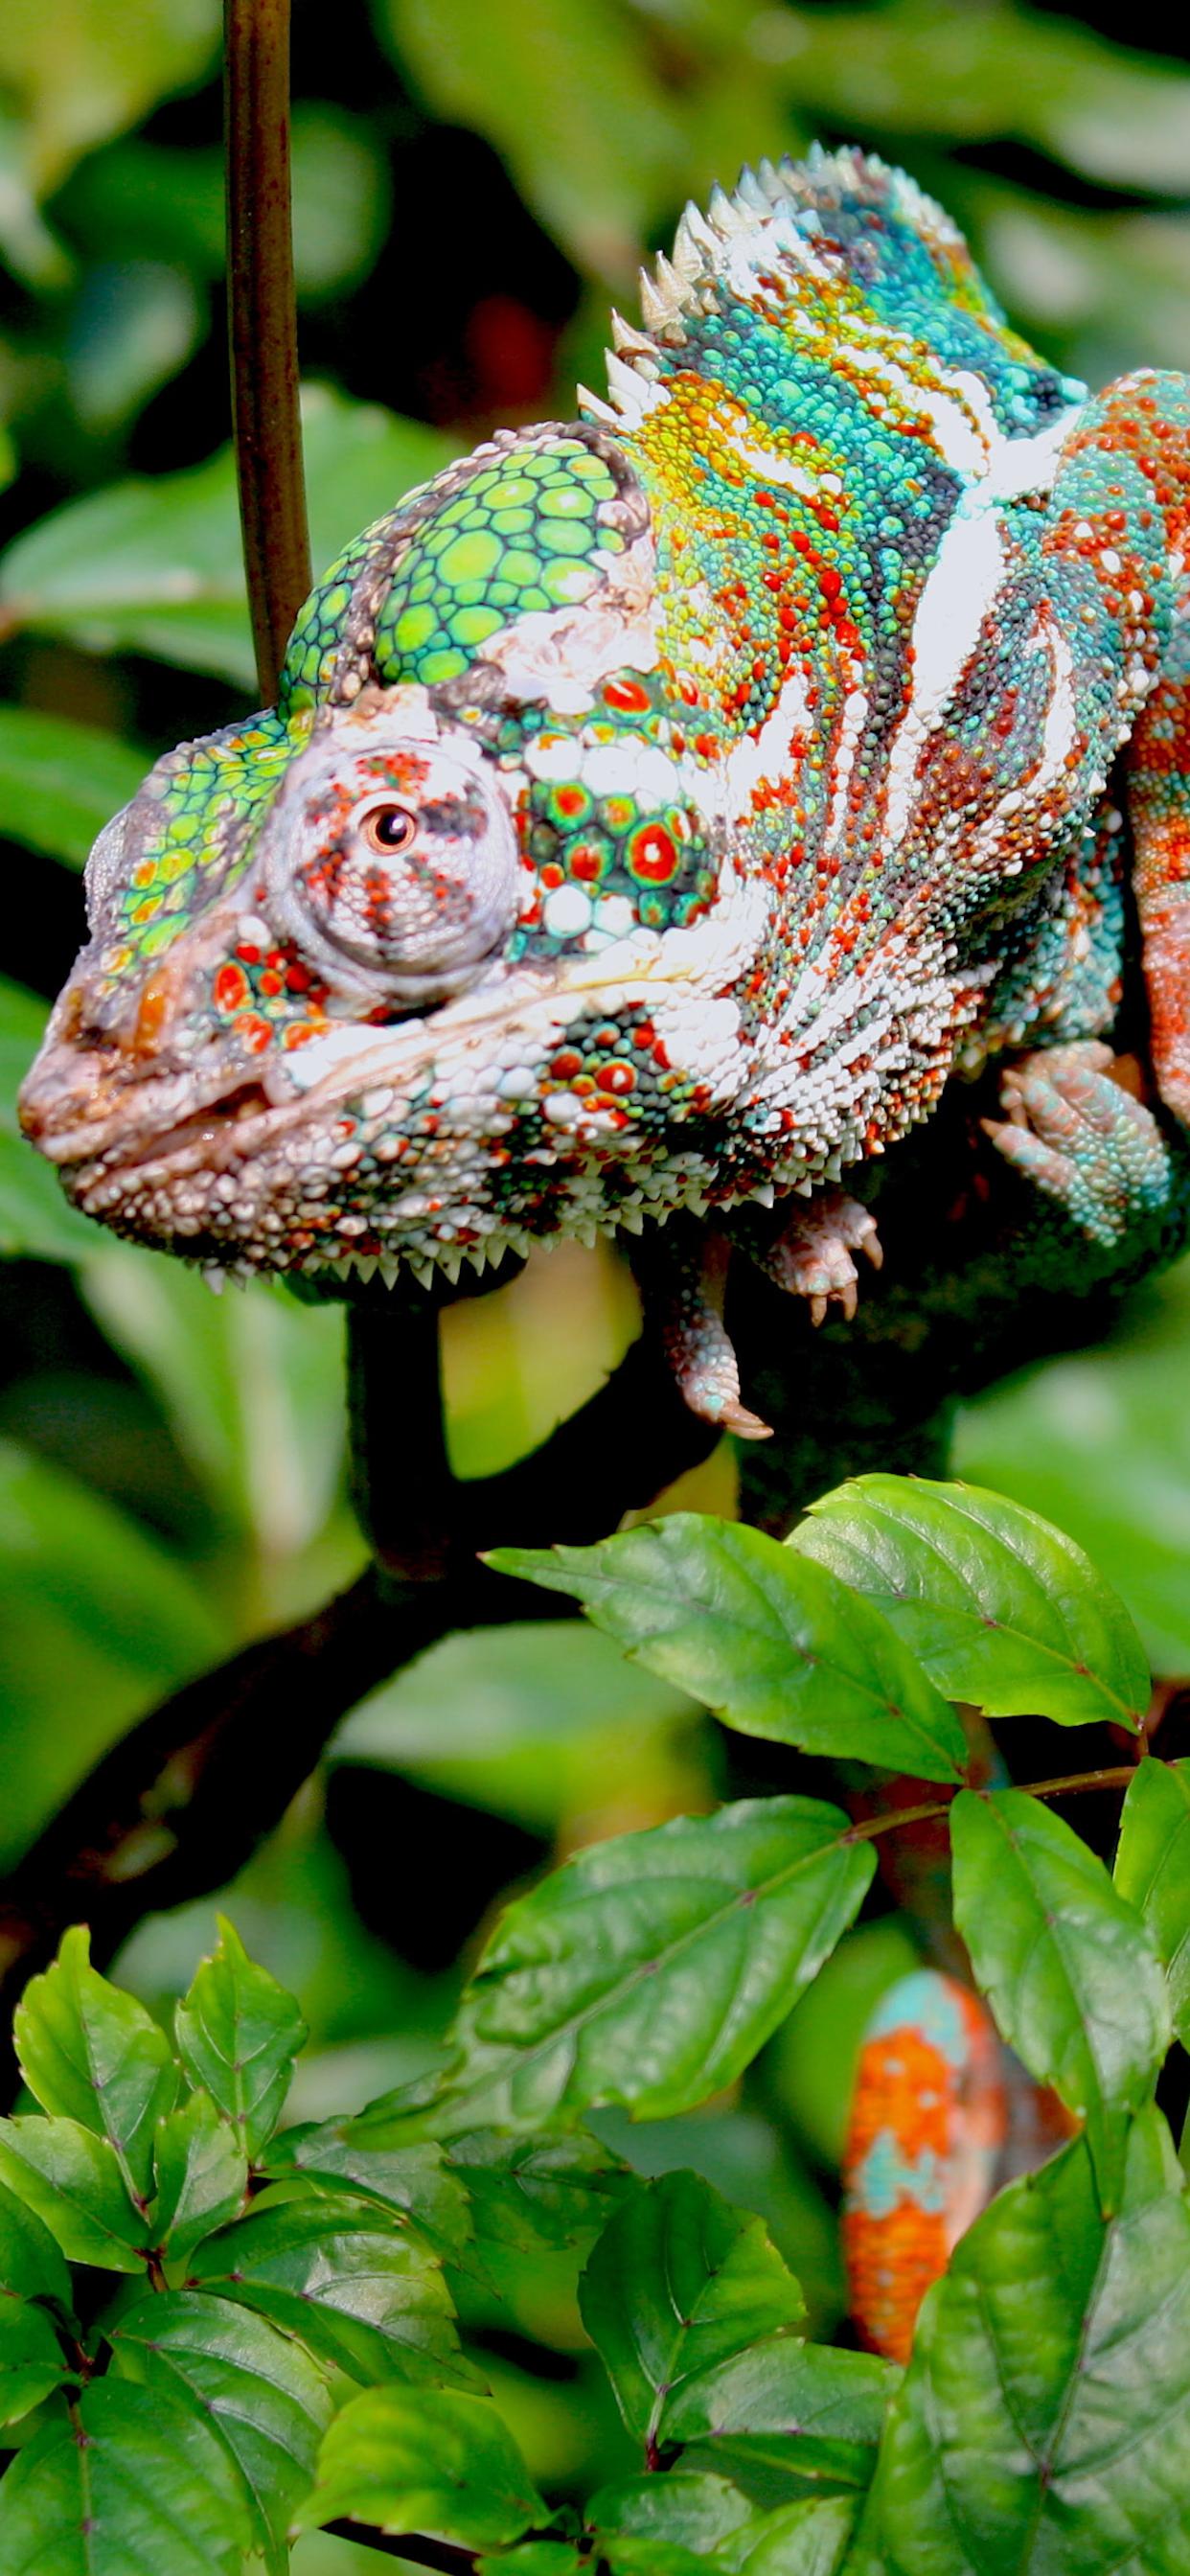 iPhone wallpapers chameleon colors masoalah Fonds d'écran iPhone du 14/01/2020